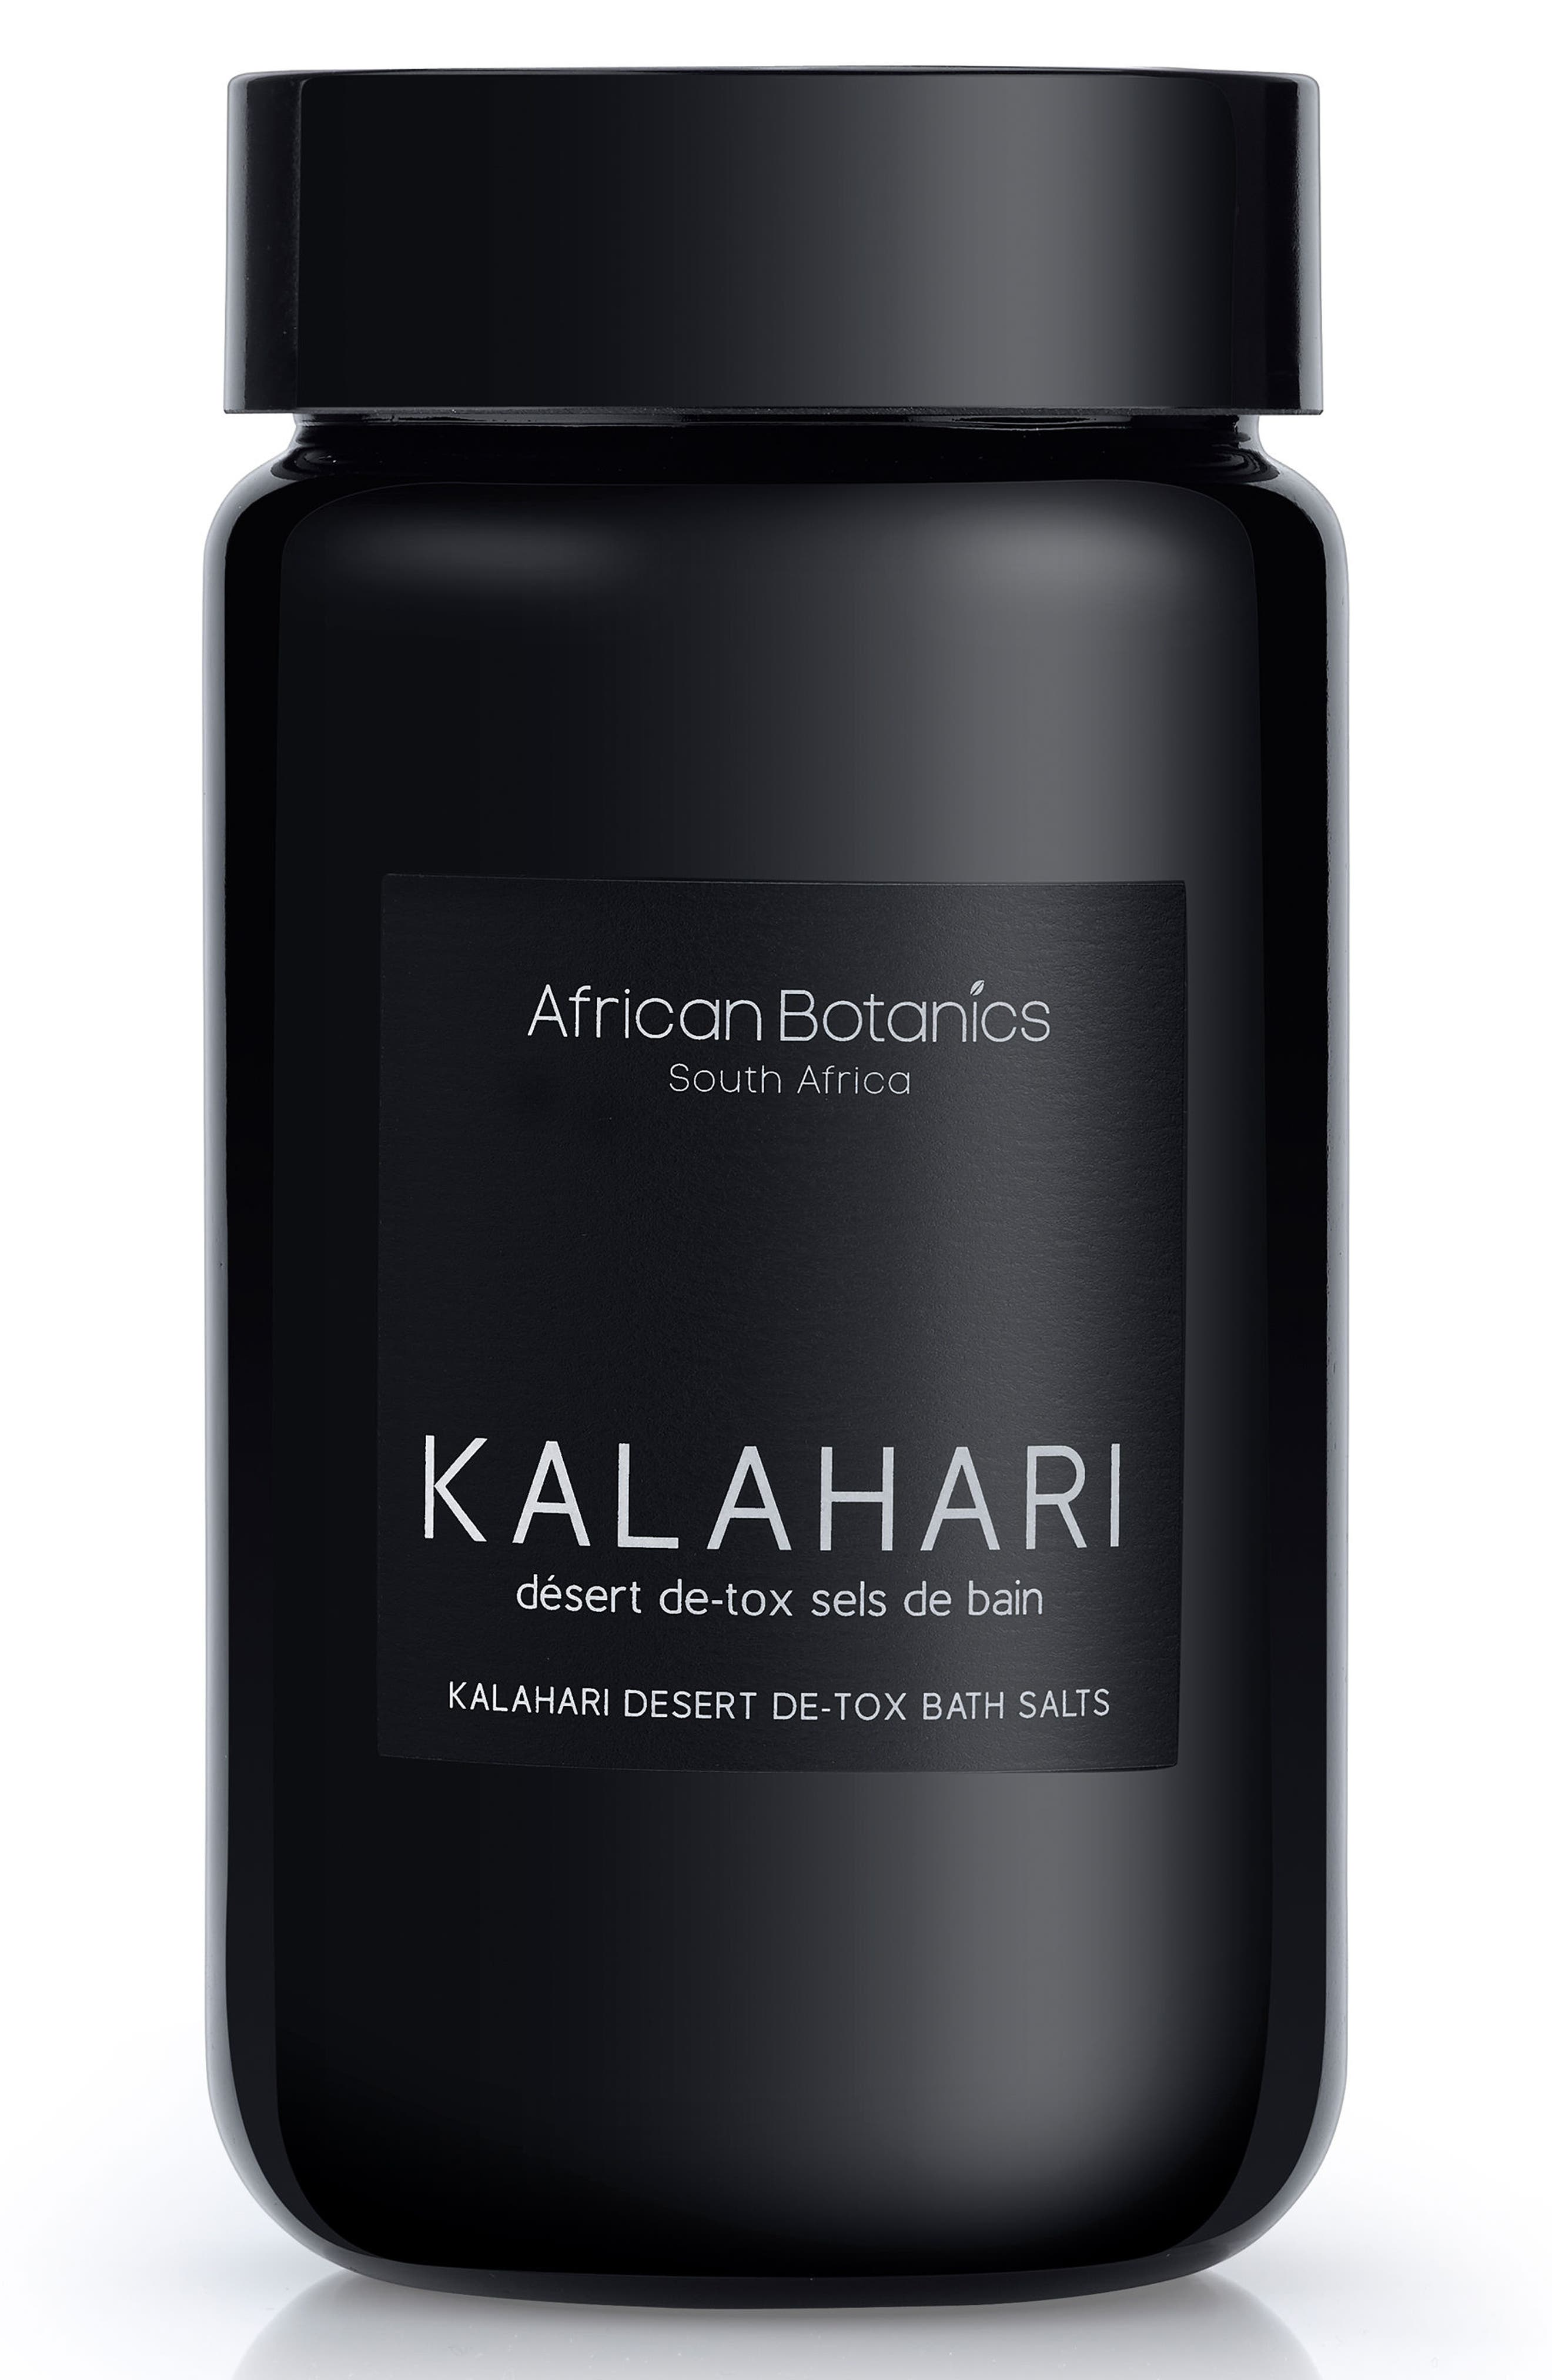 Kalahari Desert Detox Bath Salts, Main, color, 000